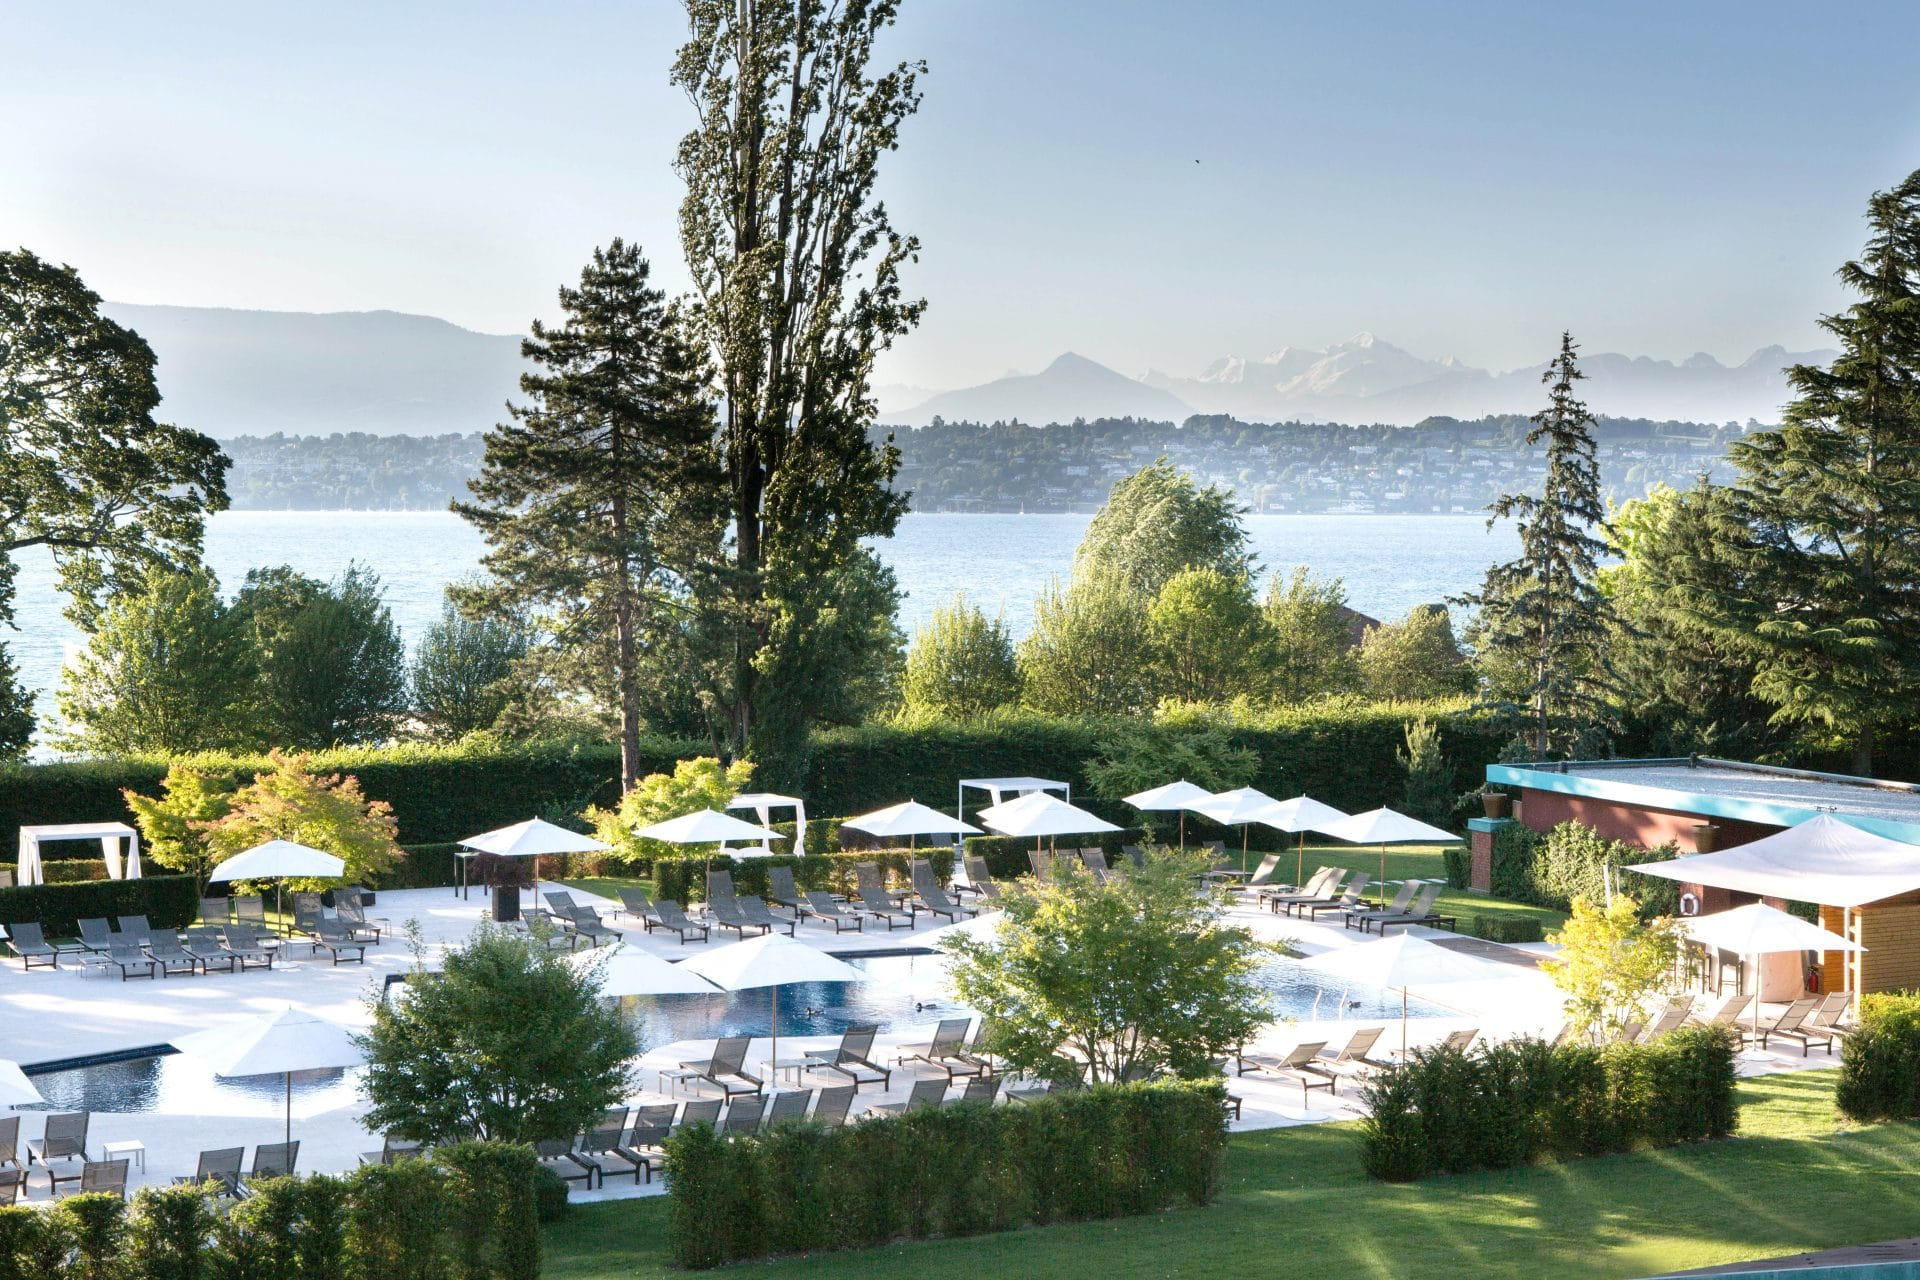 Pool Park La Reserve Geneve 1